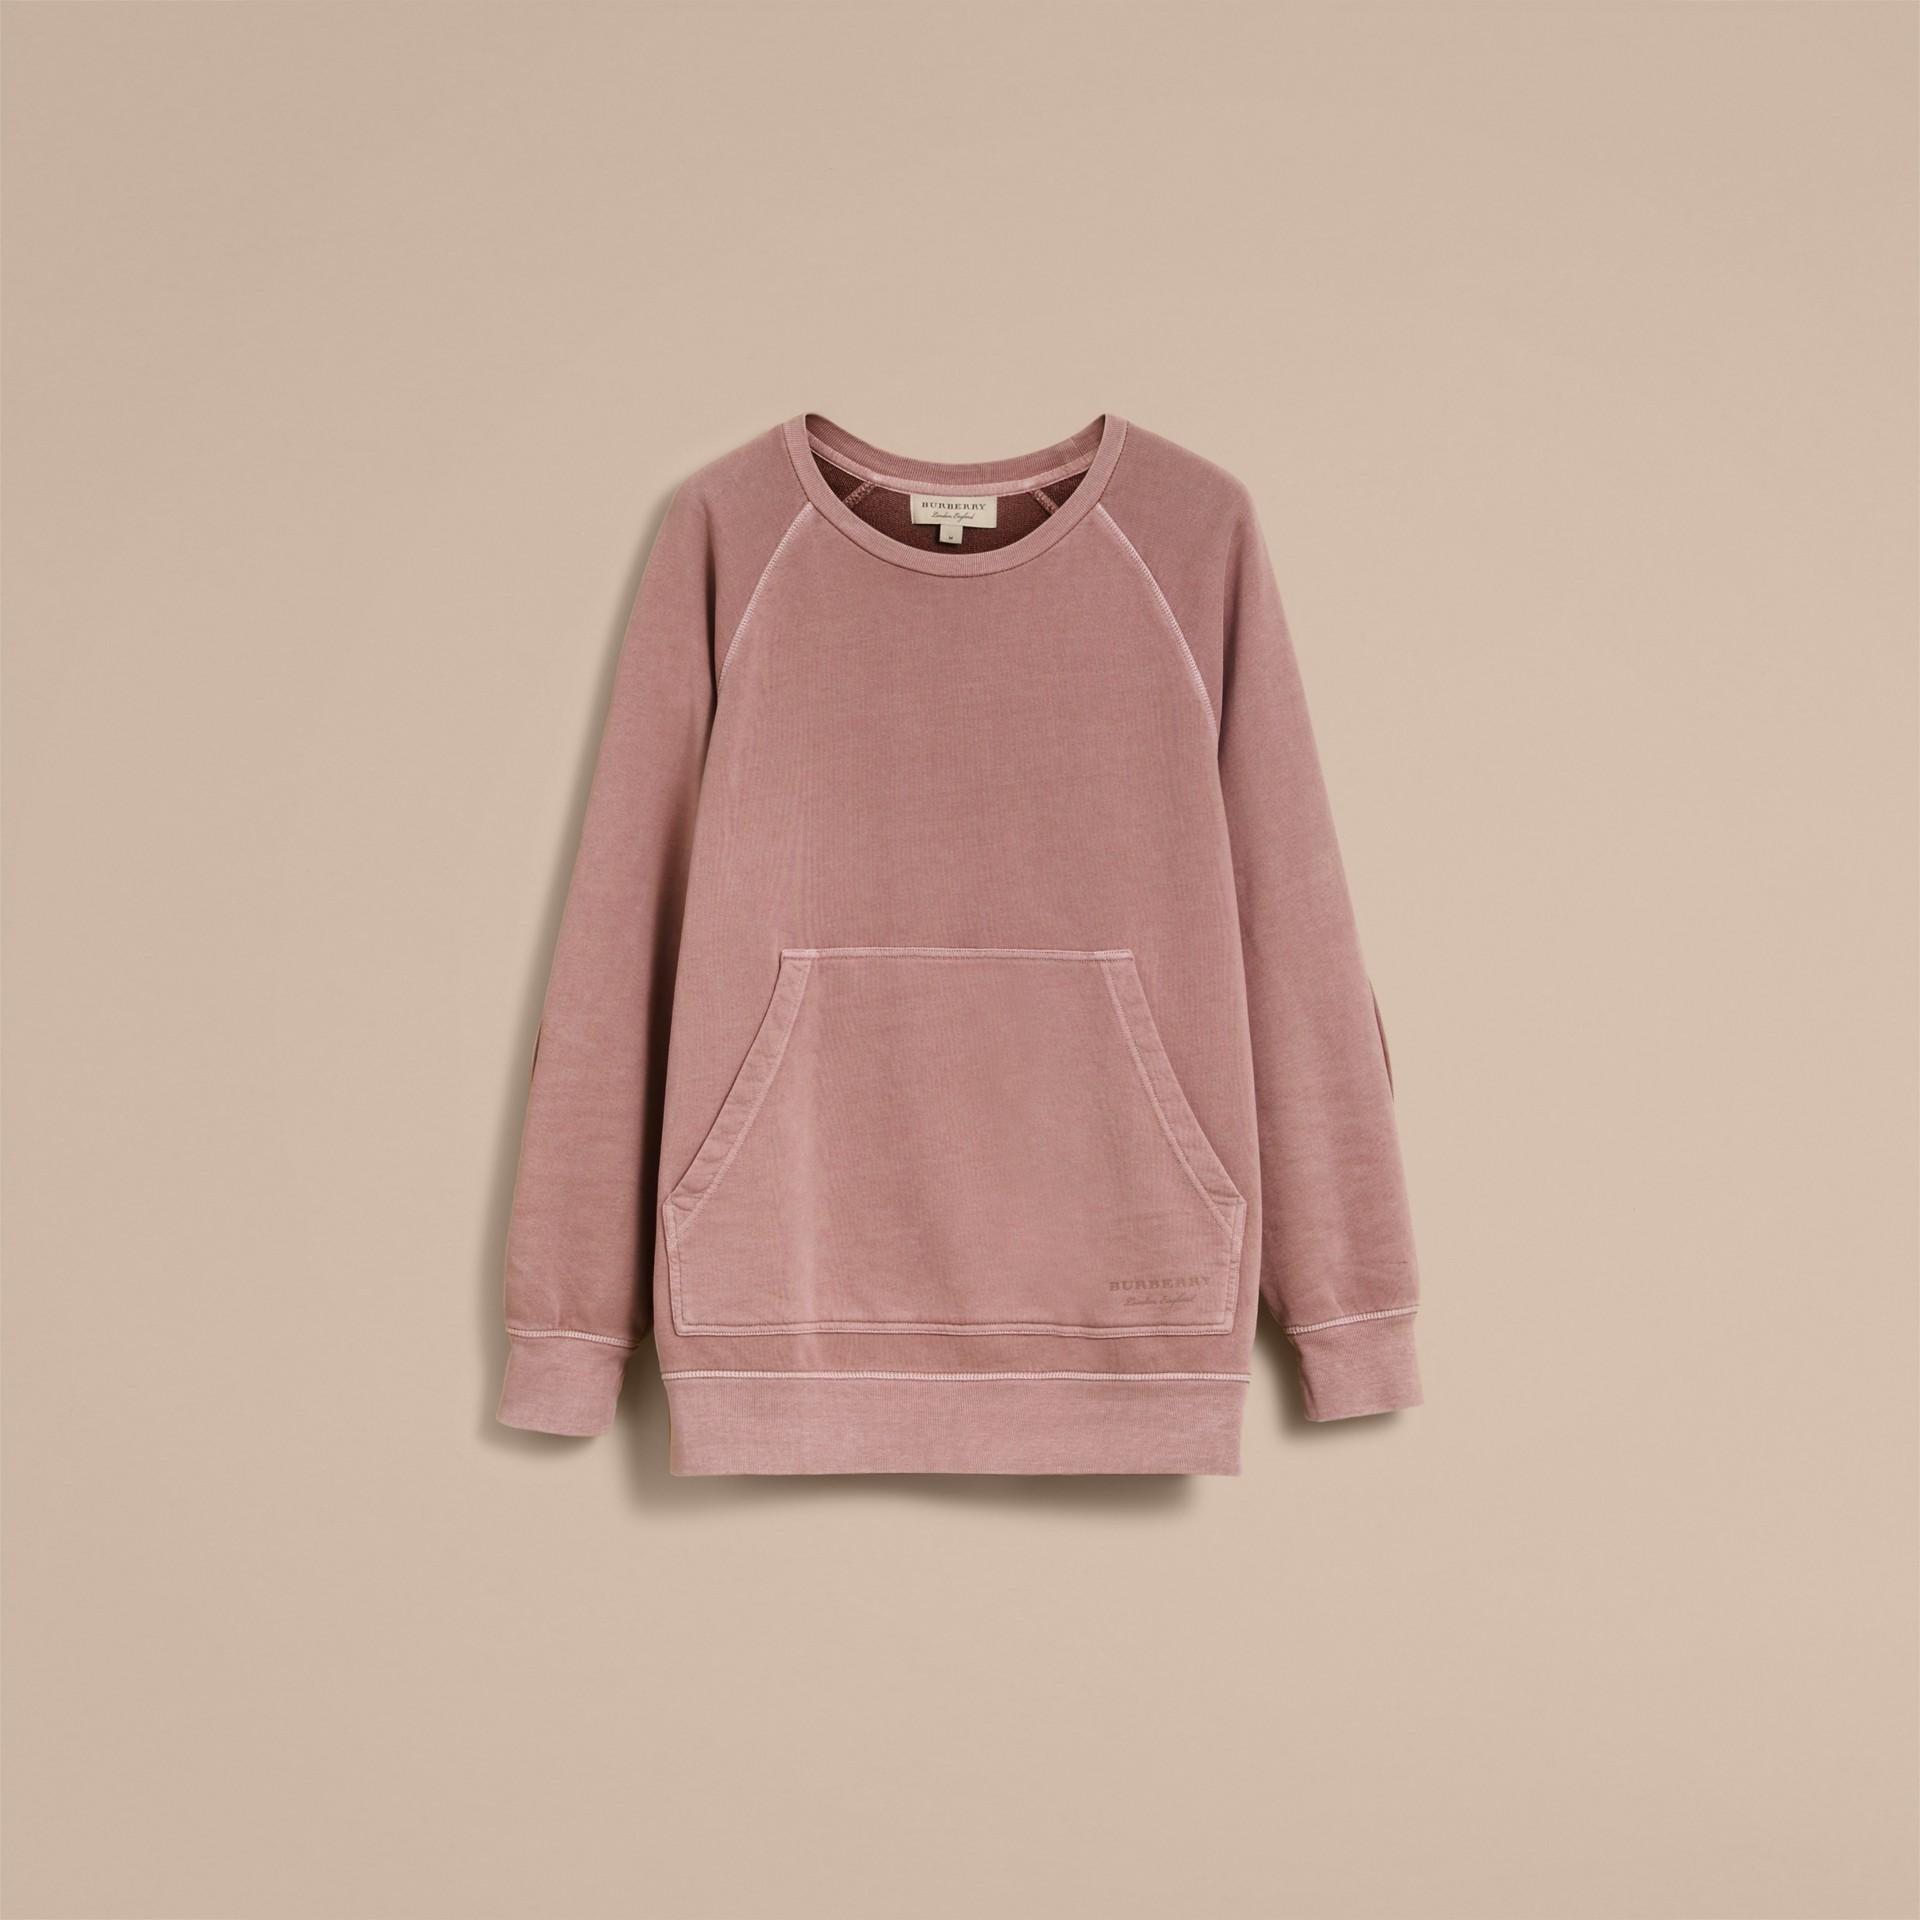 Unisex Pigment-dyed Cotton Oversize Sweatshirt Dusty Mauve - gallery image 4